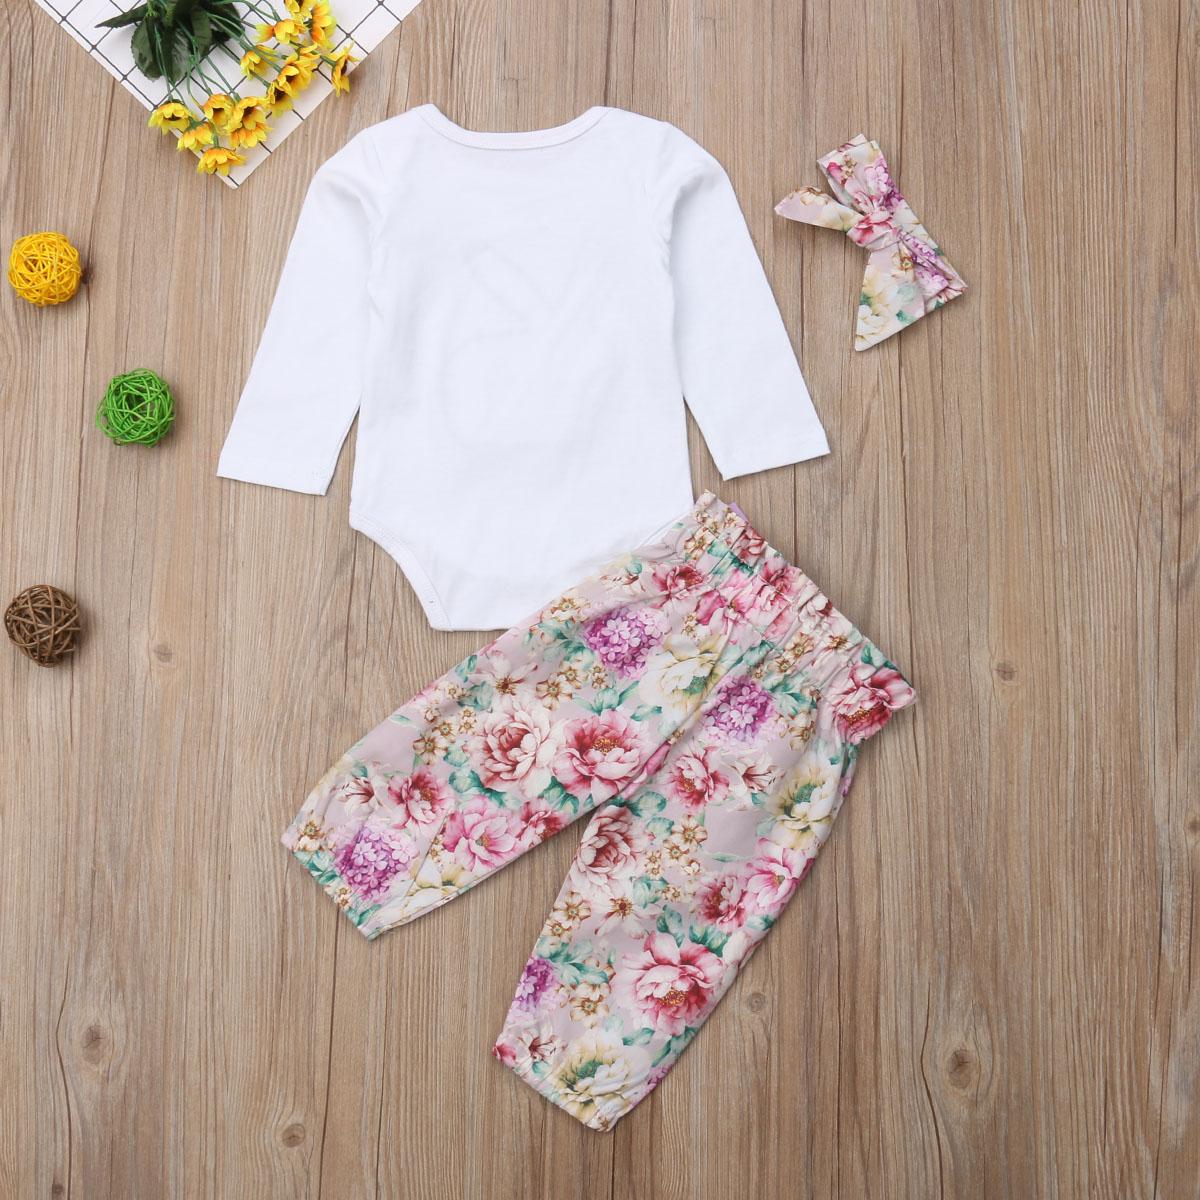 3Pcs Newborn Baby Girls Rabbit Tops Romper Pants Headband Outfits Set Clothes